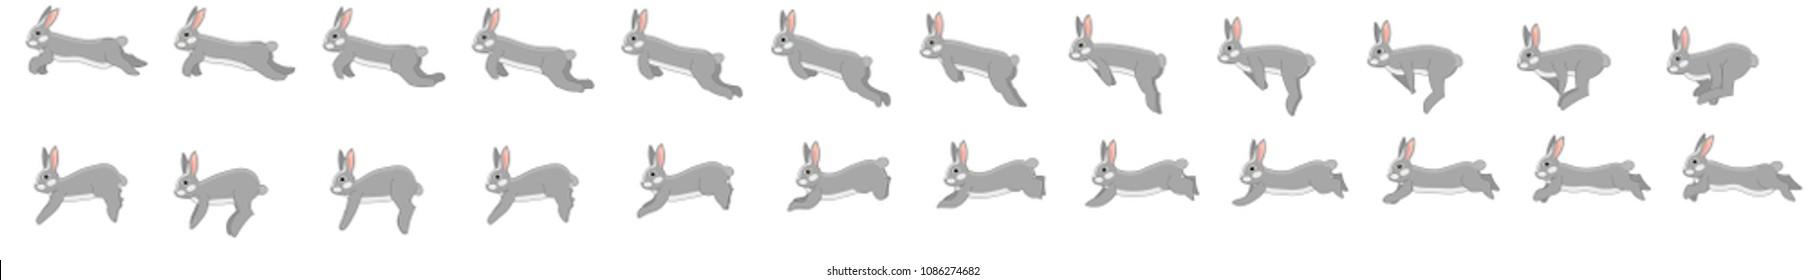 Rabbit run cycle animation sprite sheet